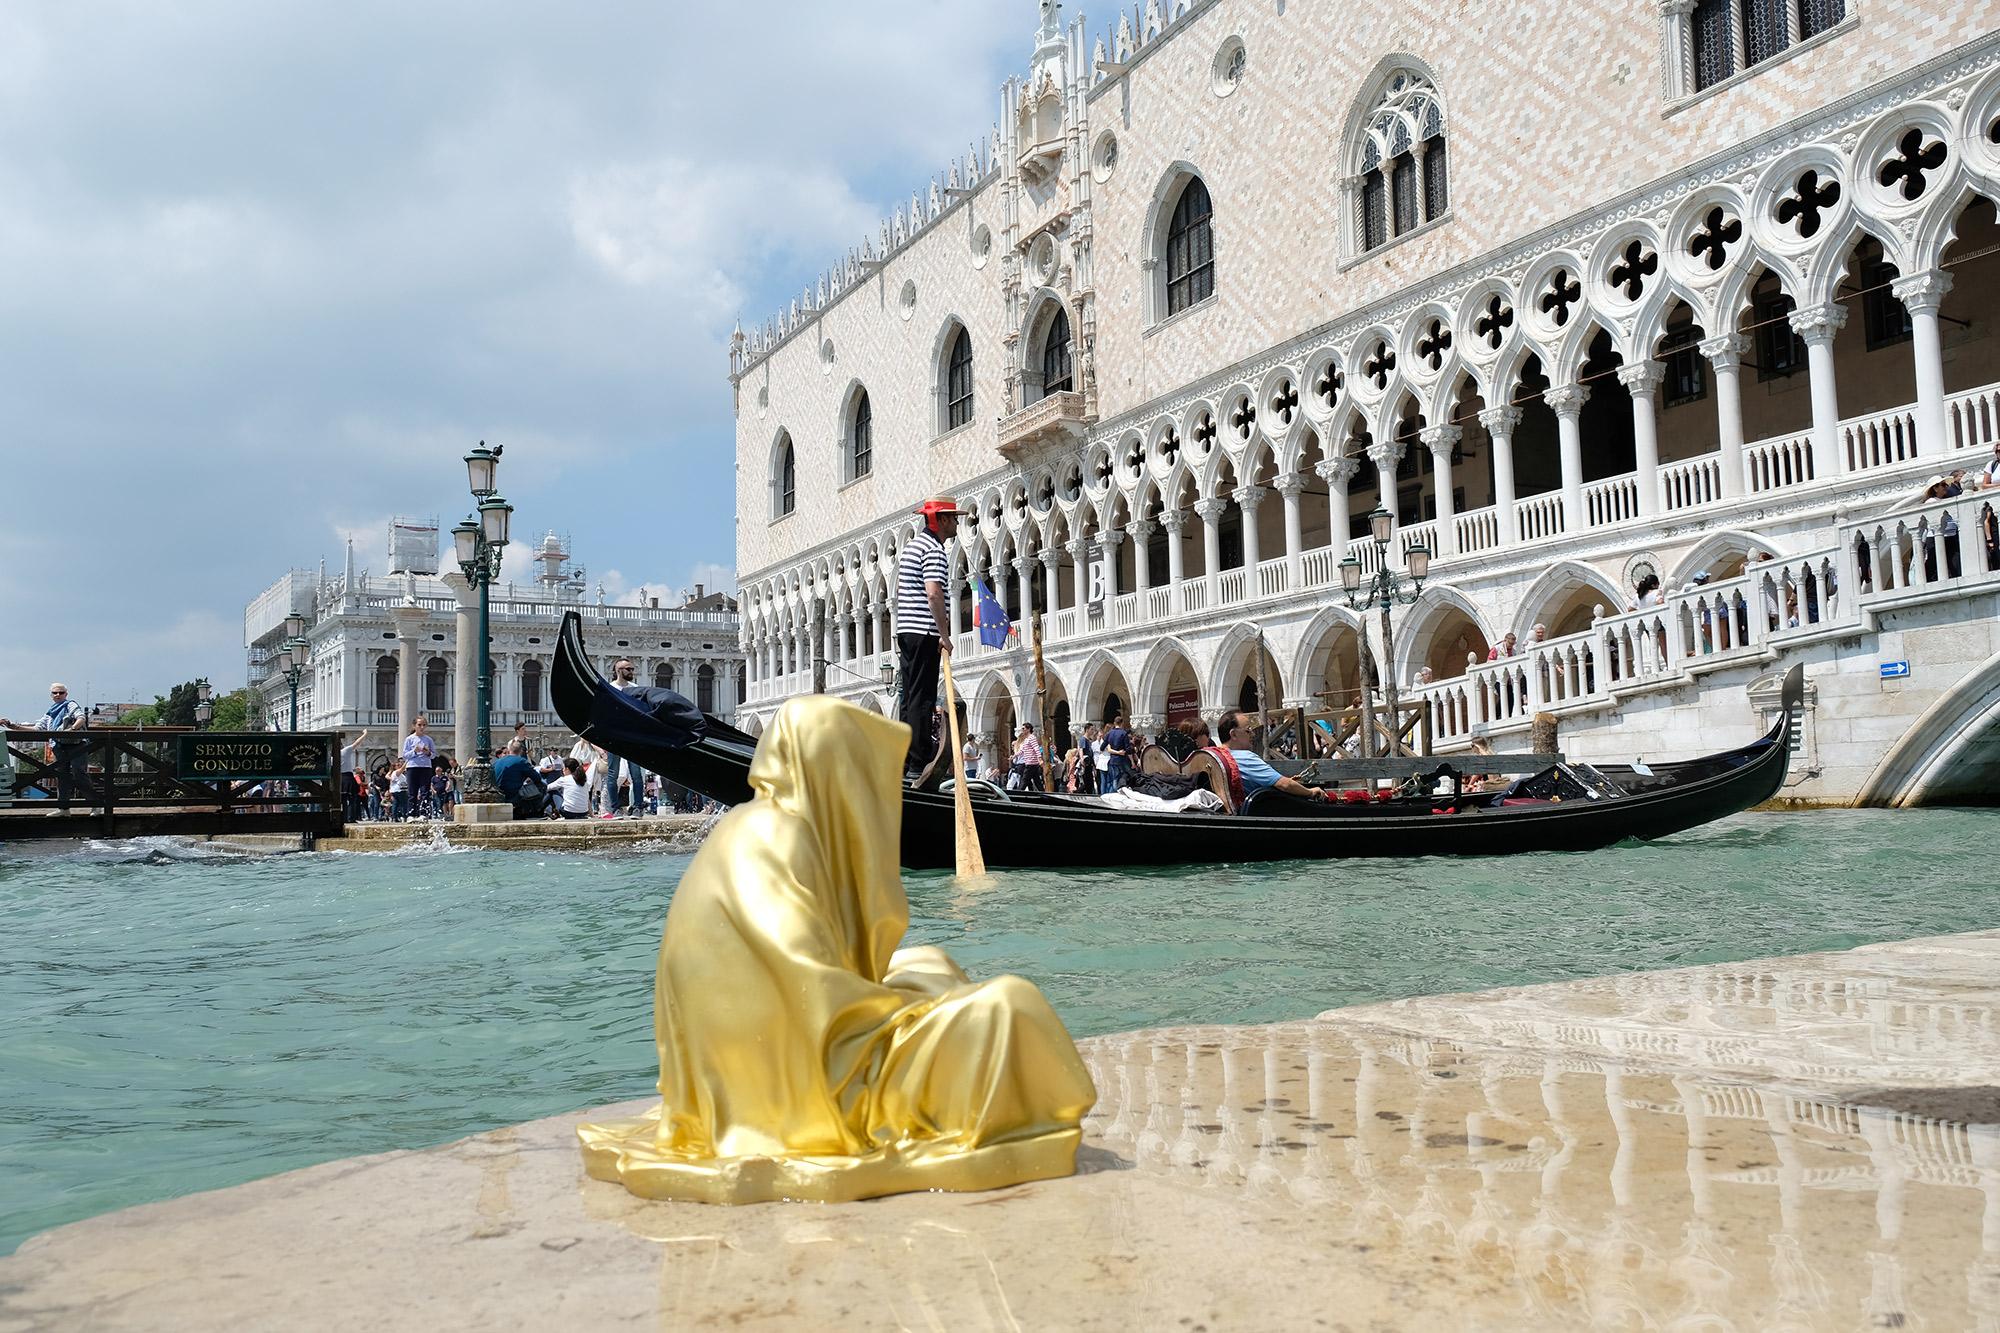 Biennale venezia venice artfair artbiennial manfred for Artisti biennale venezia